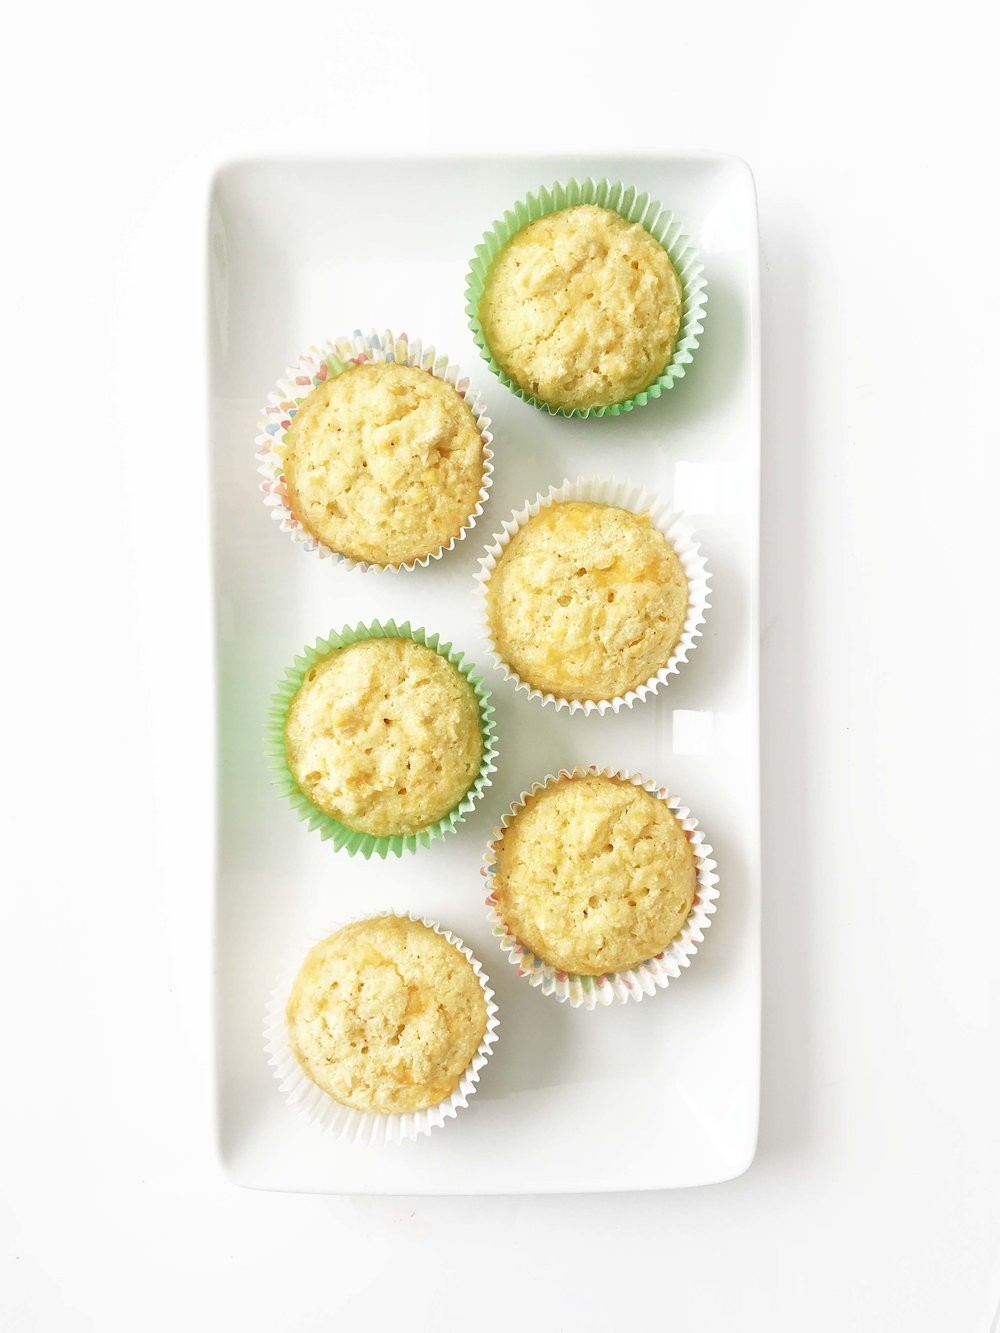 cornbread-chicken-cupcakes15.jpg